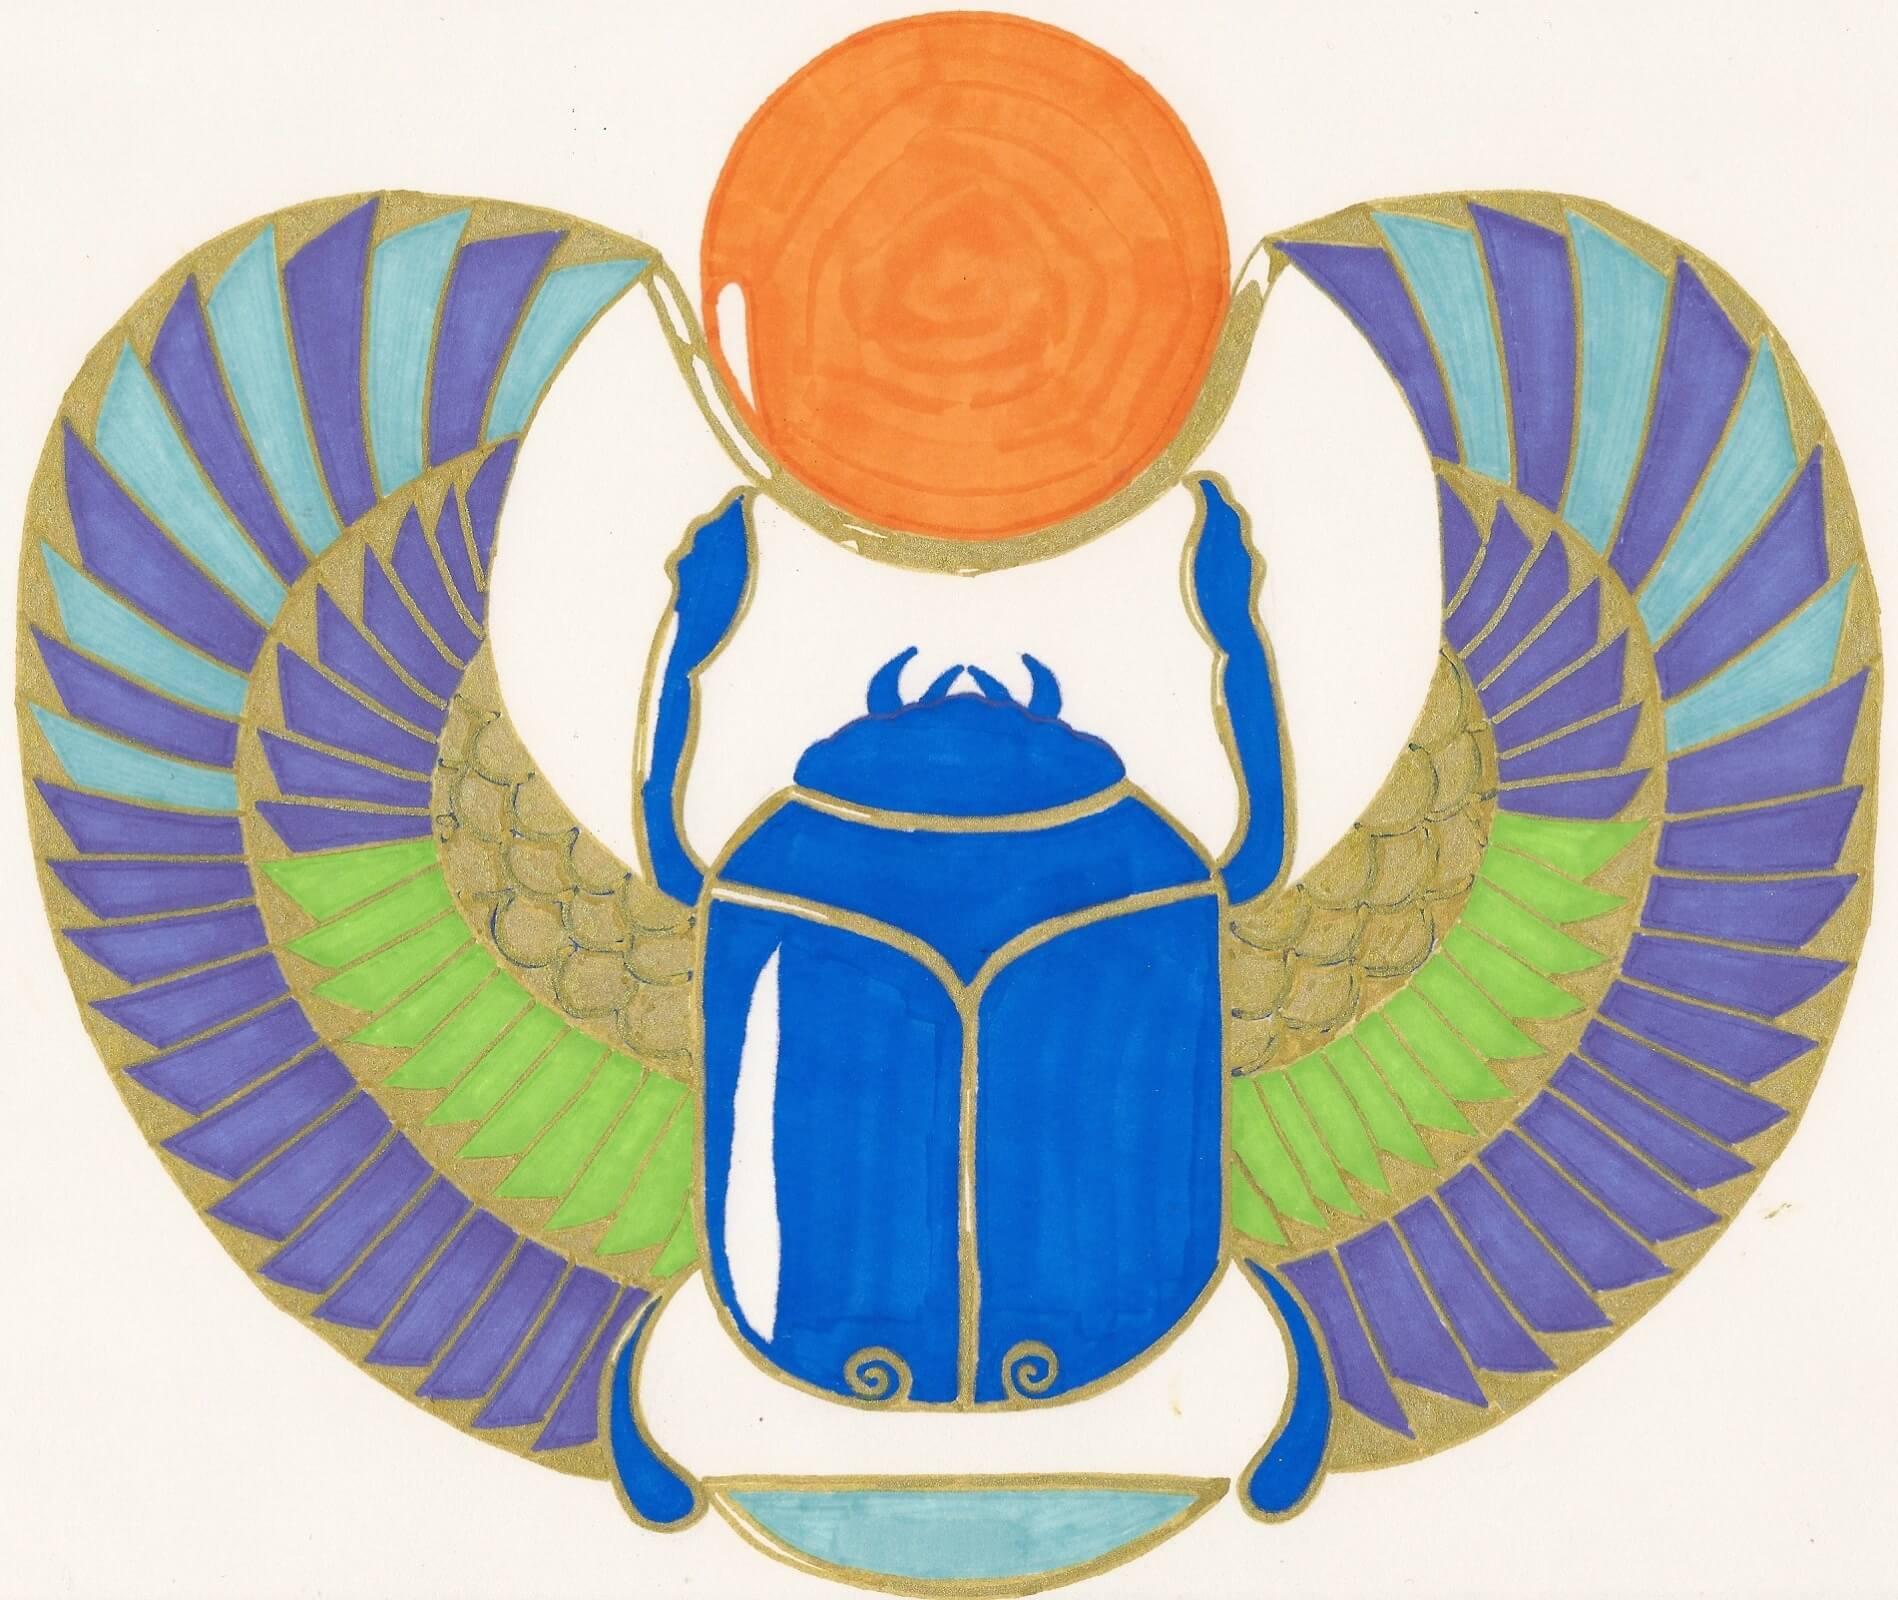 symbolisme animal : Le scarabée